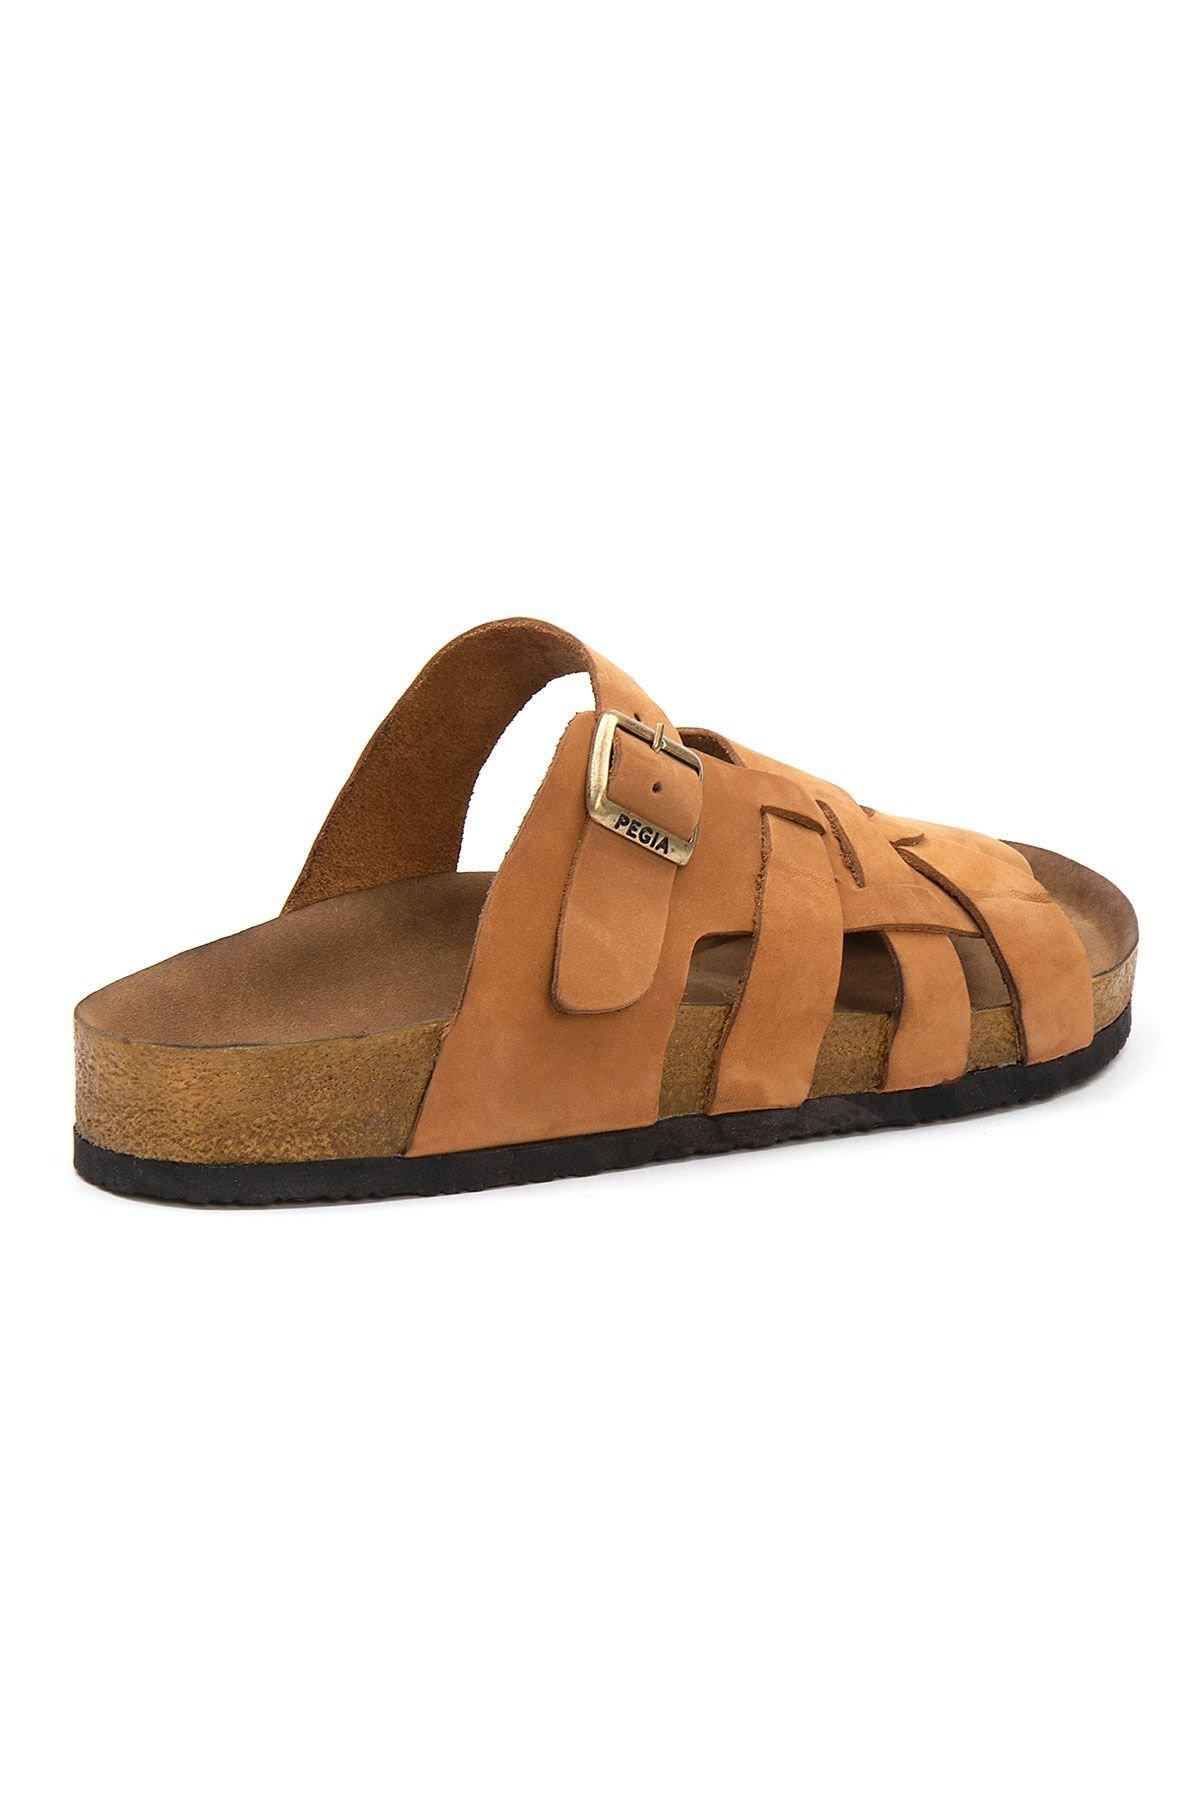 Pegia Men's Genuine Leather Slippers 215025 Ginger